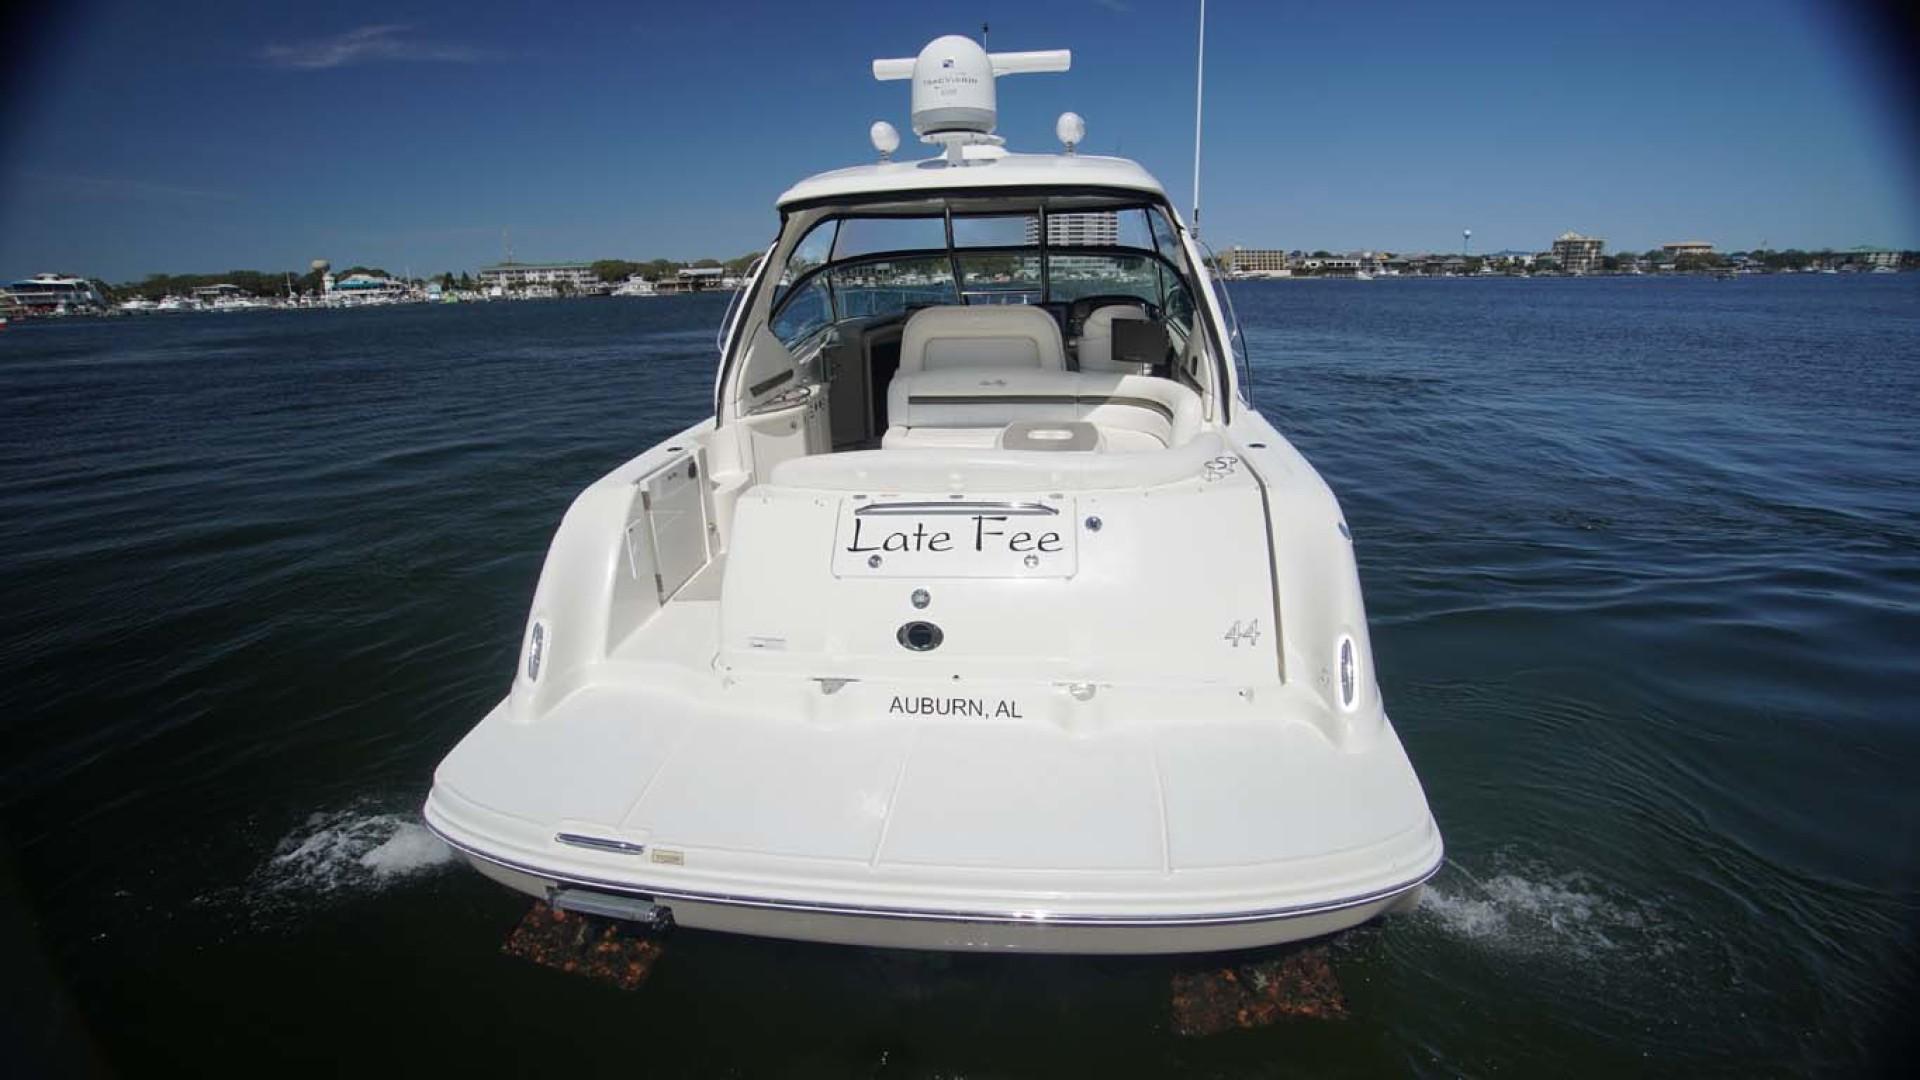 Sea Ray-Sundancer 2006-Late Fee Destin-Florida-United States-Stern-1125979 | Thumbnail